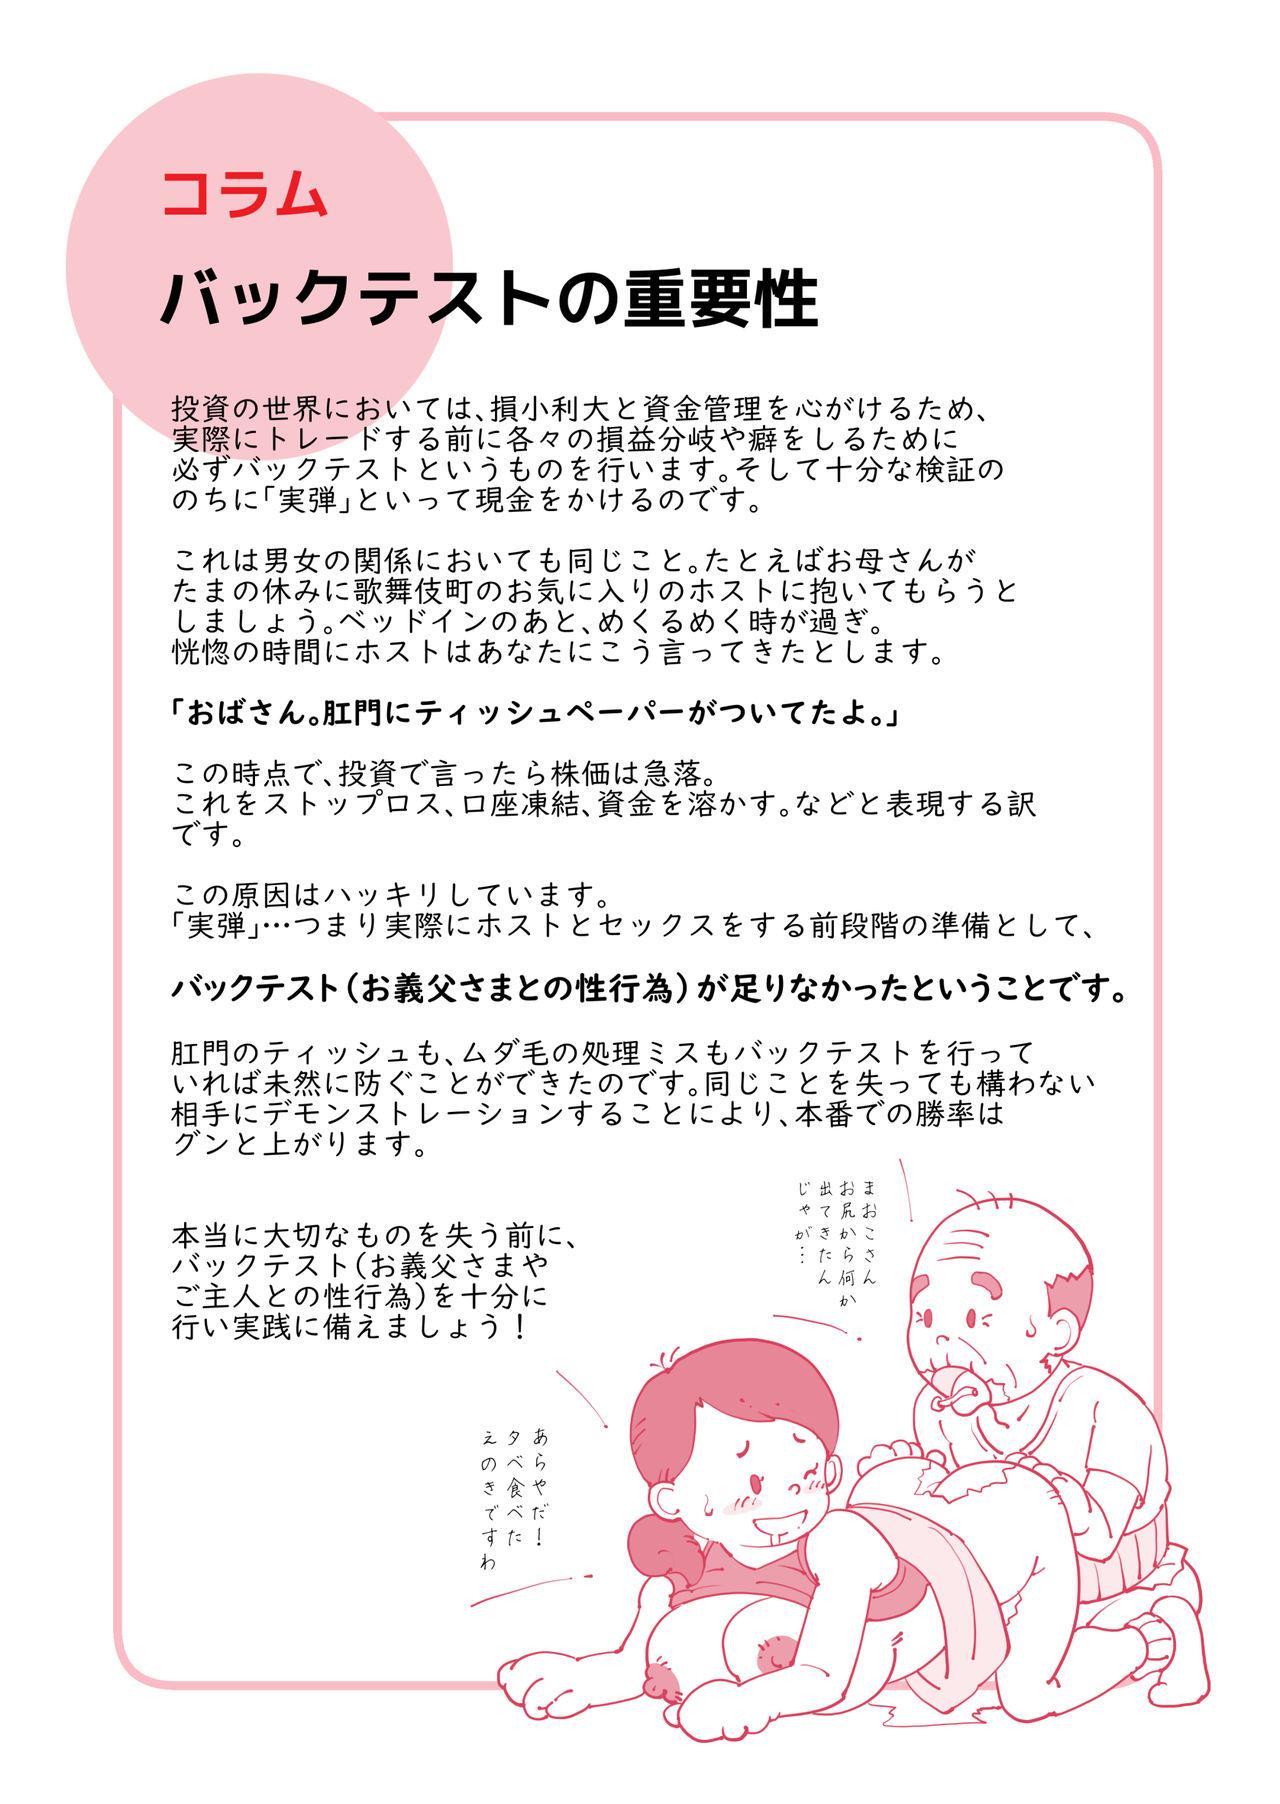 Isogasii Okaasan No Tamuno Sasa Rouzin Seikaigo | Guide for Elderly Sex Health Care to Busy Mom 15